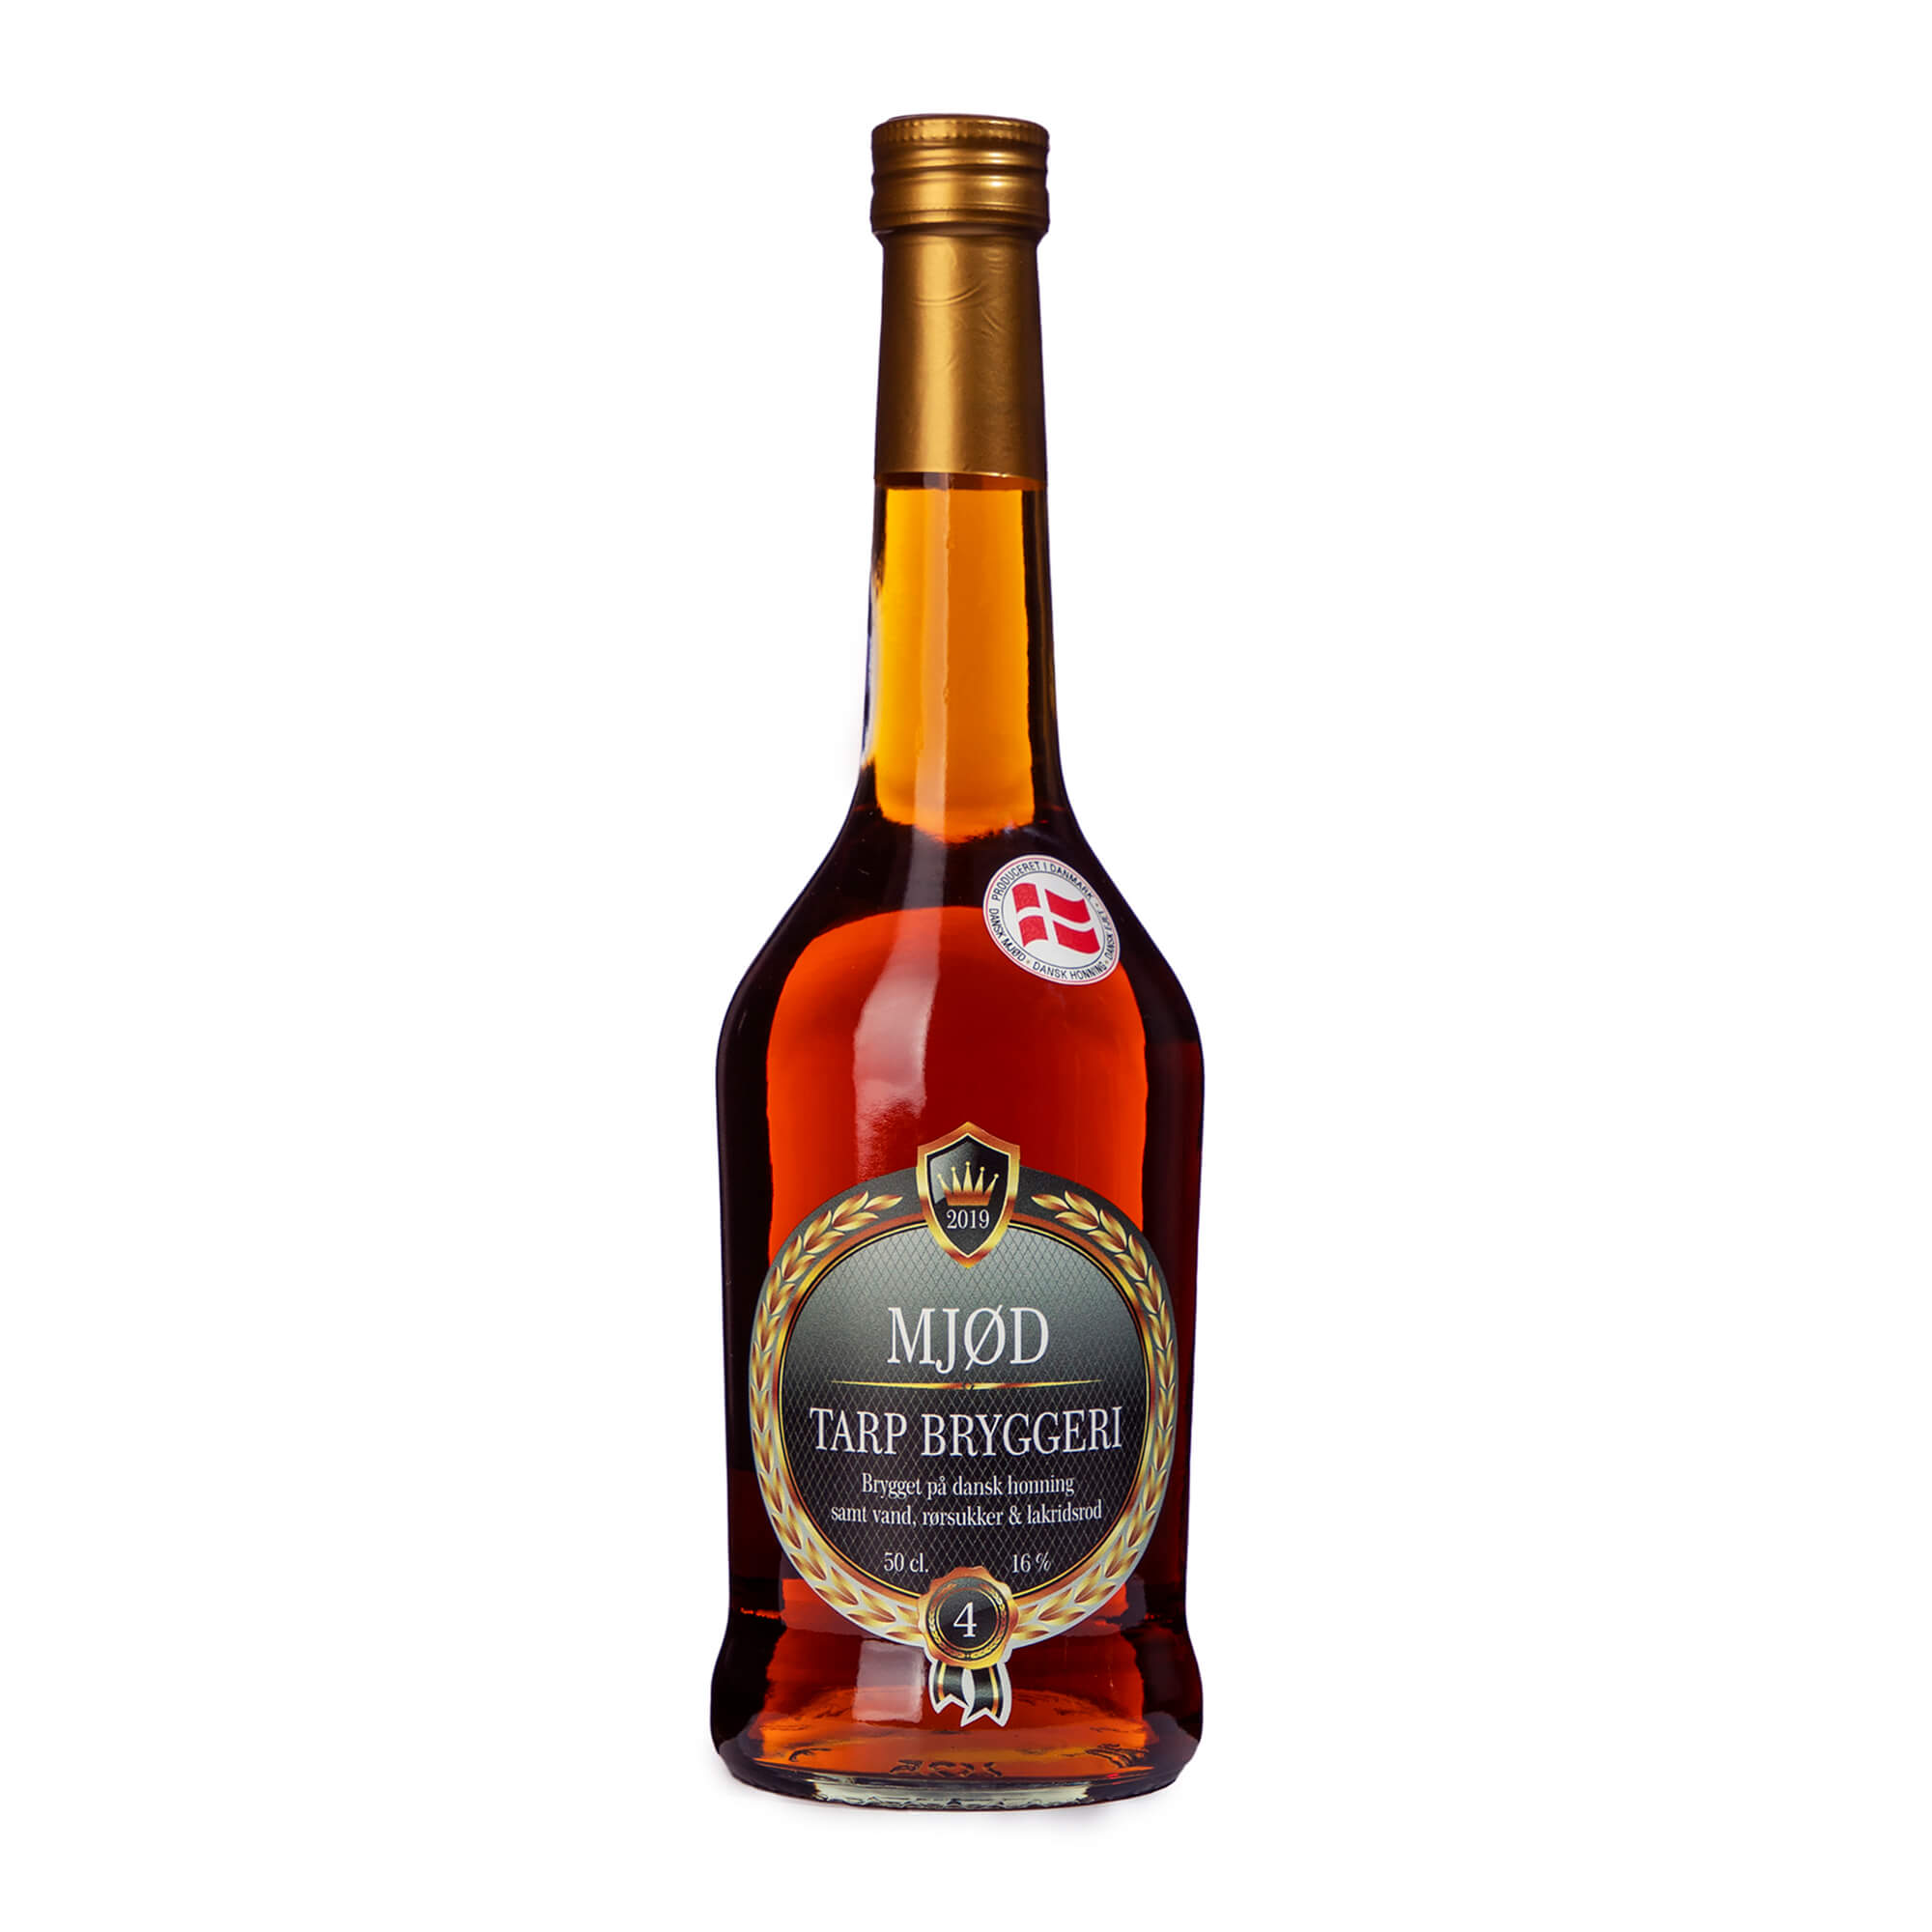 Vintermjød - Tarp Bryggeri